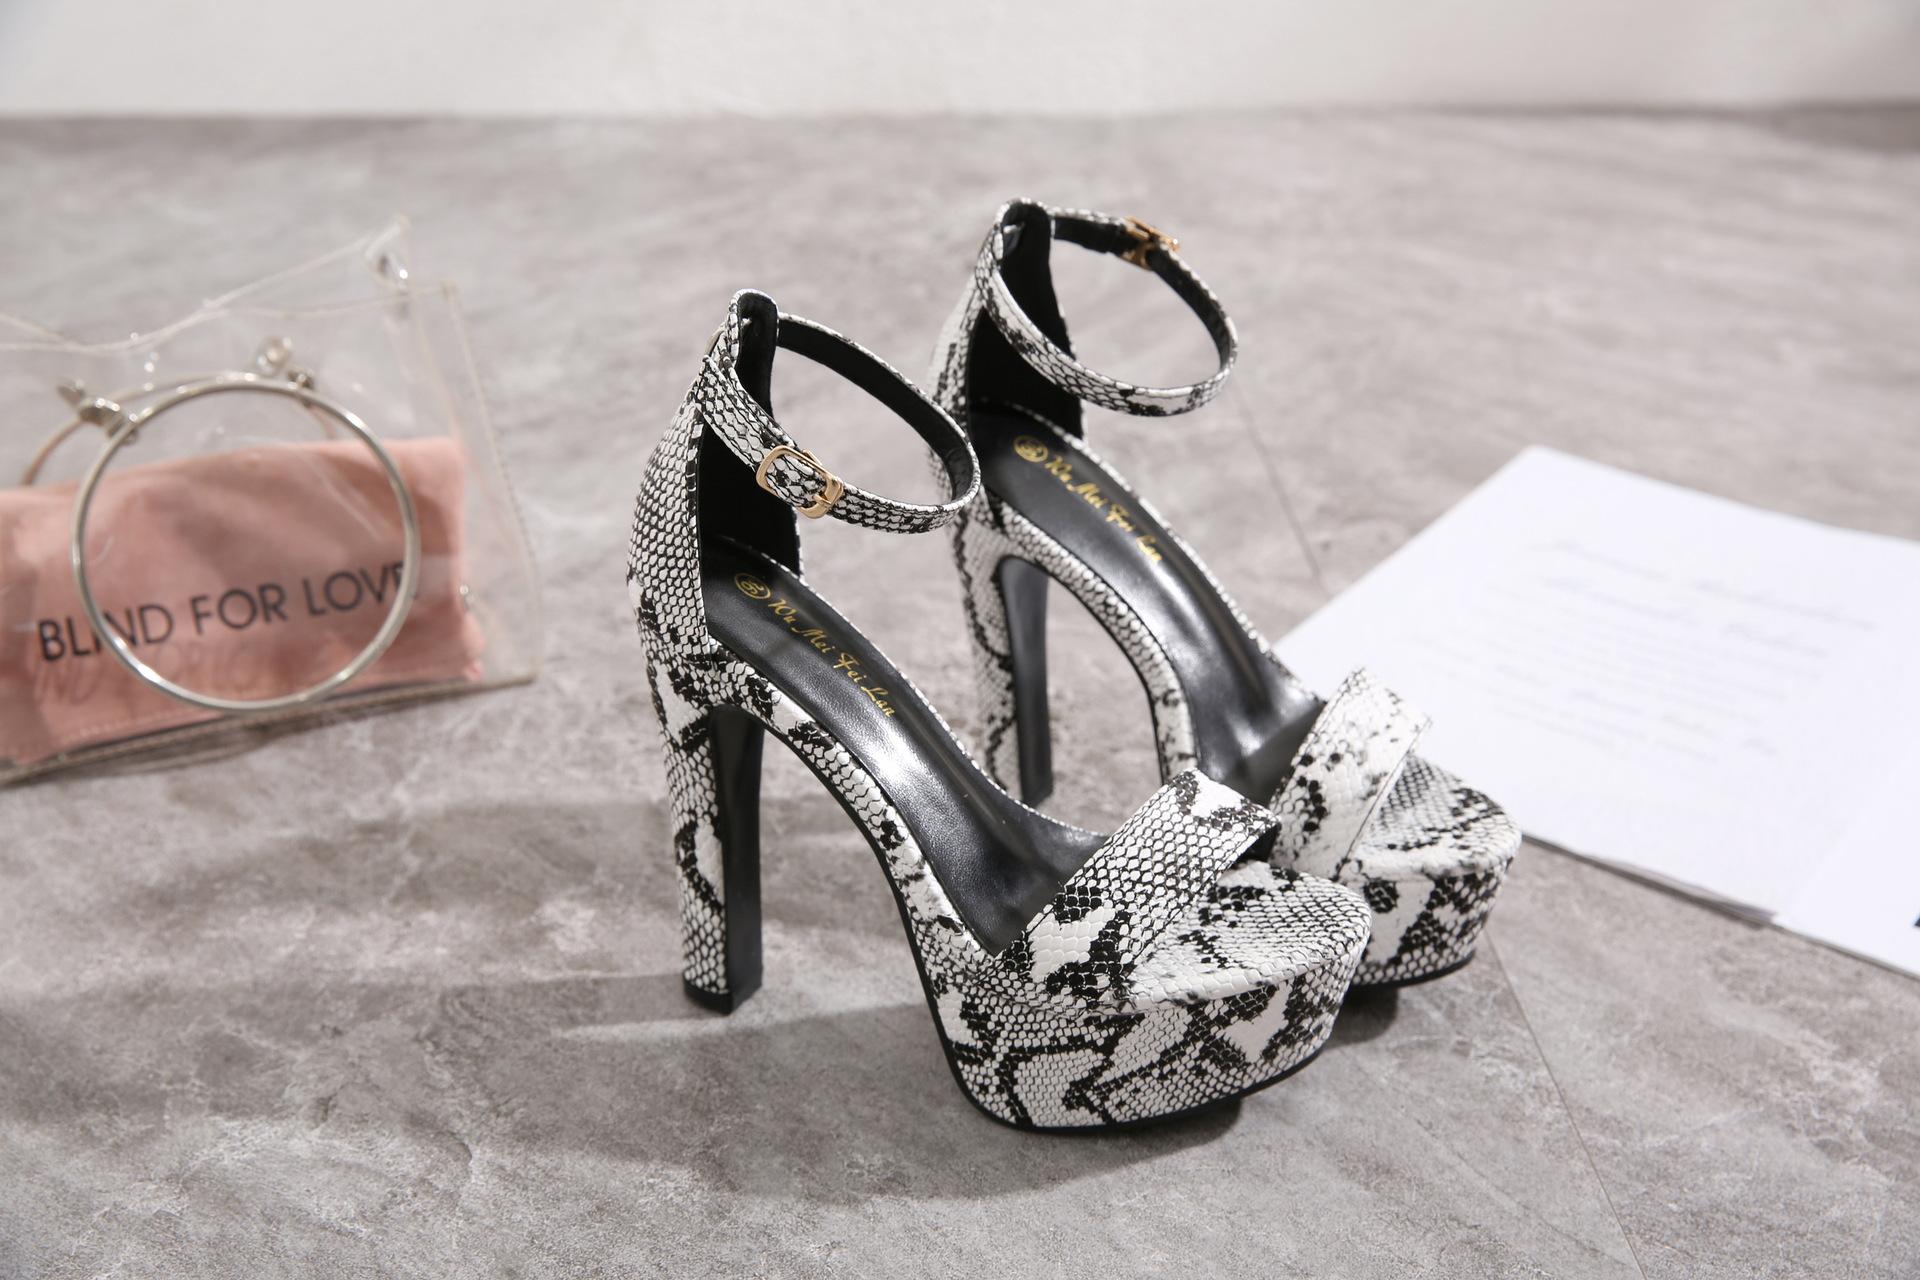 New Women's Shoes Sexy Snakeskin Open Toe Buckle High Heel Sandals NHSO193031